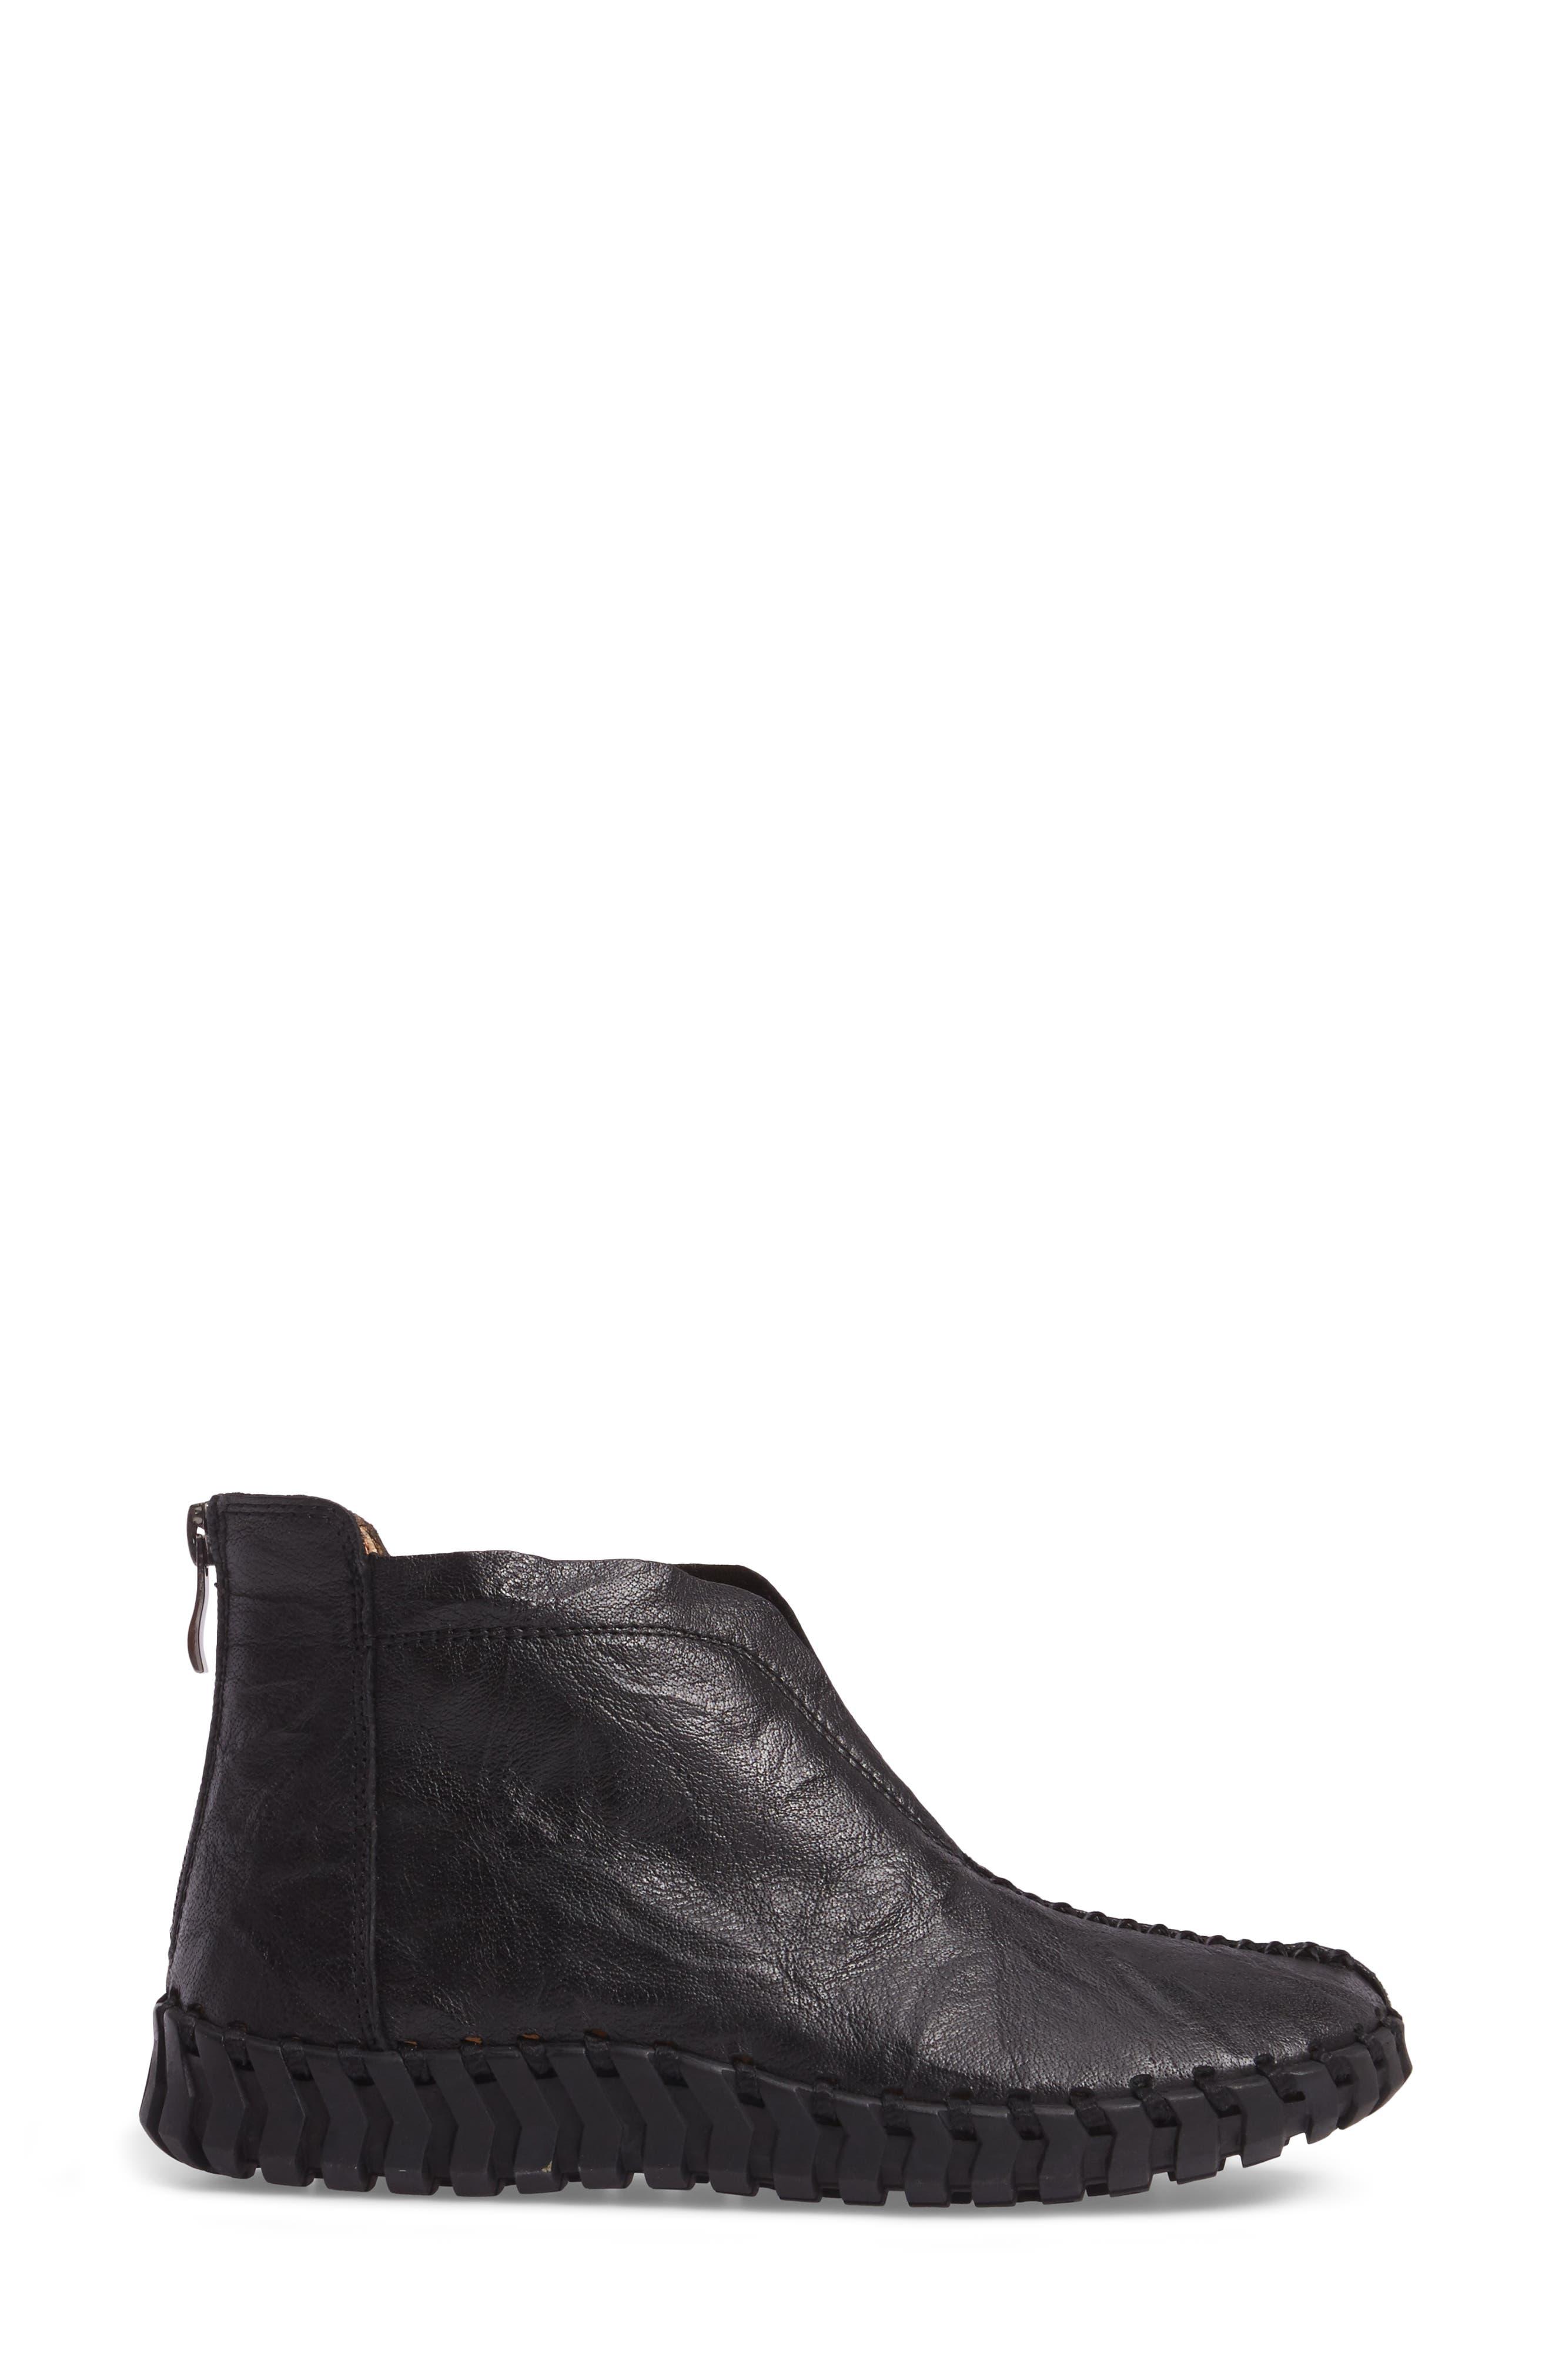 TW79 Bootie,                             Alternate thumbnail 3, color,                             Black Leather